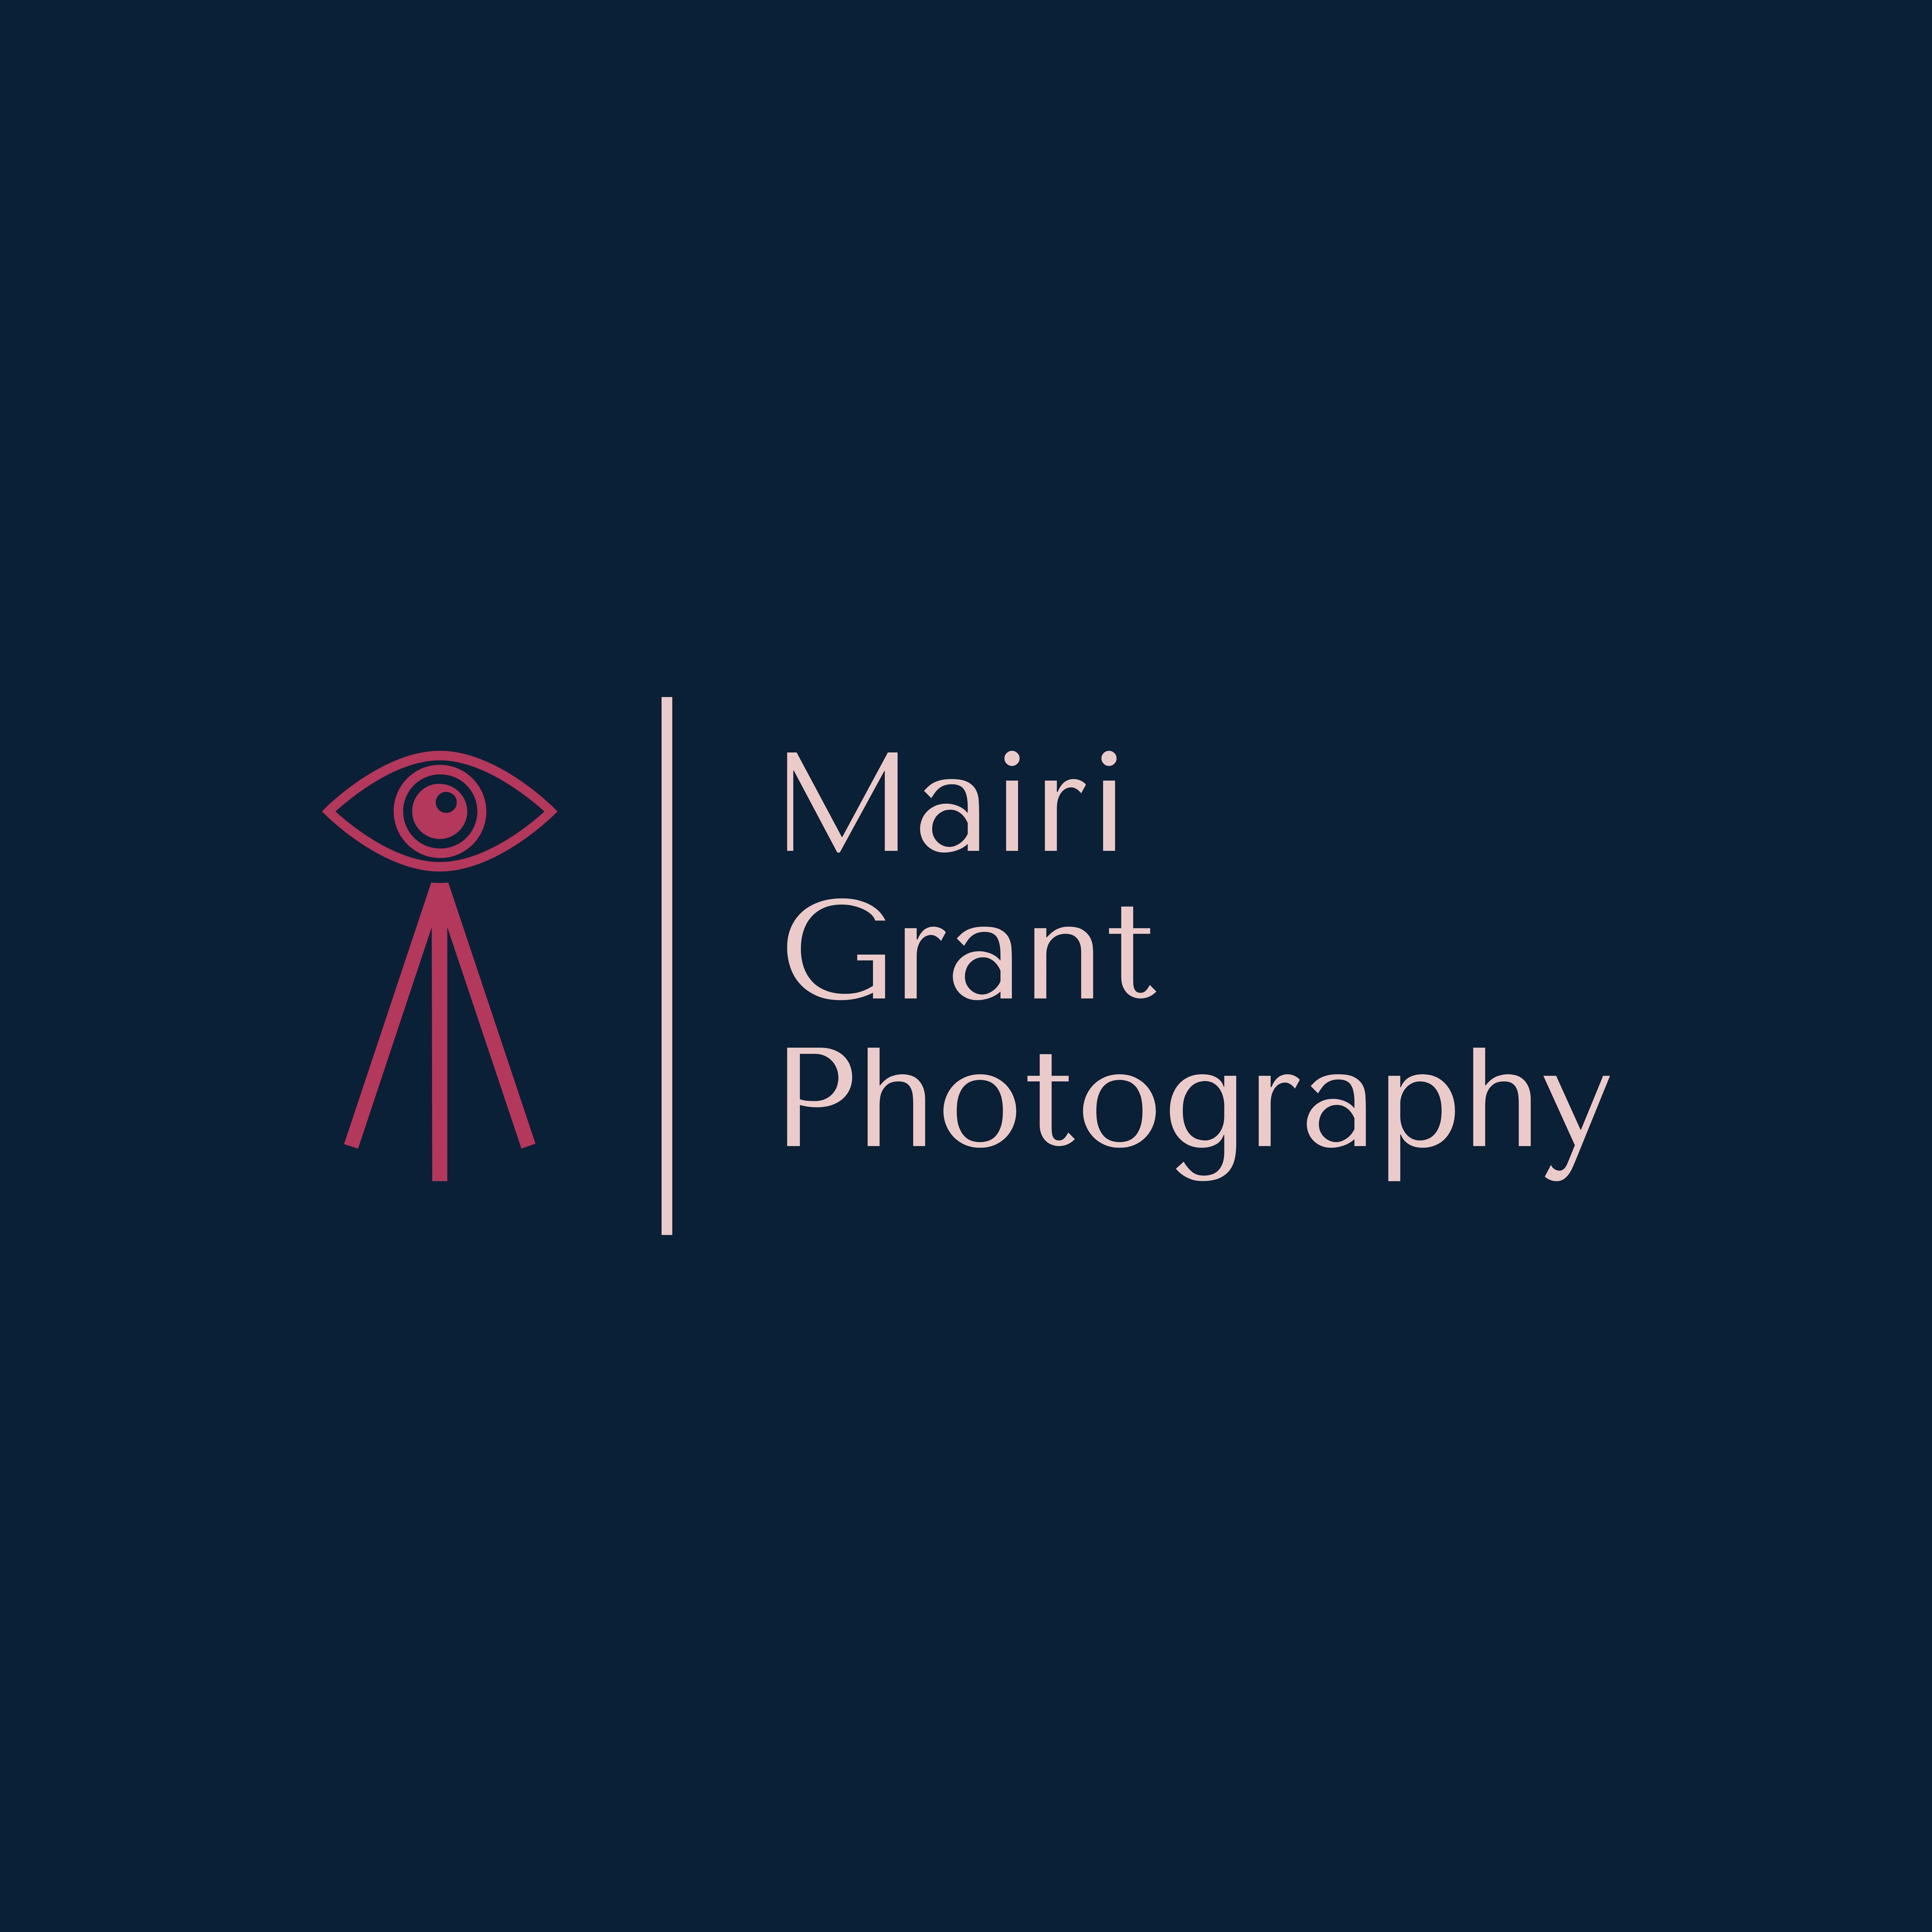 Mairi Grant Photography